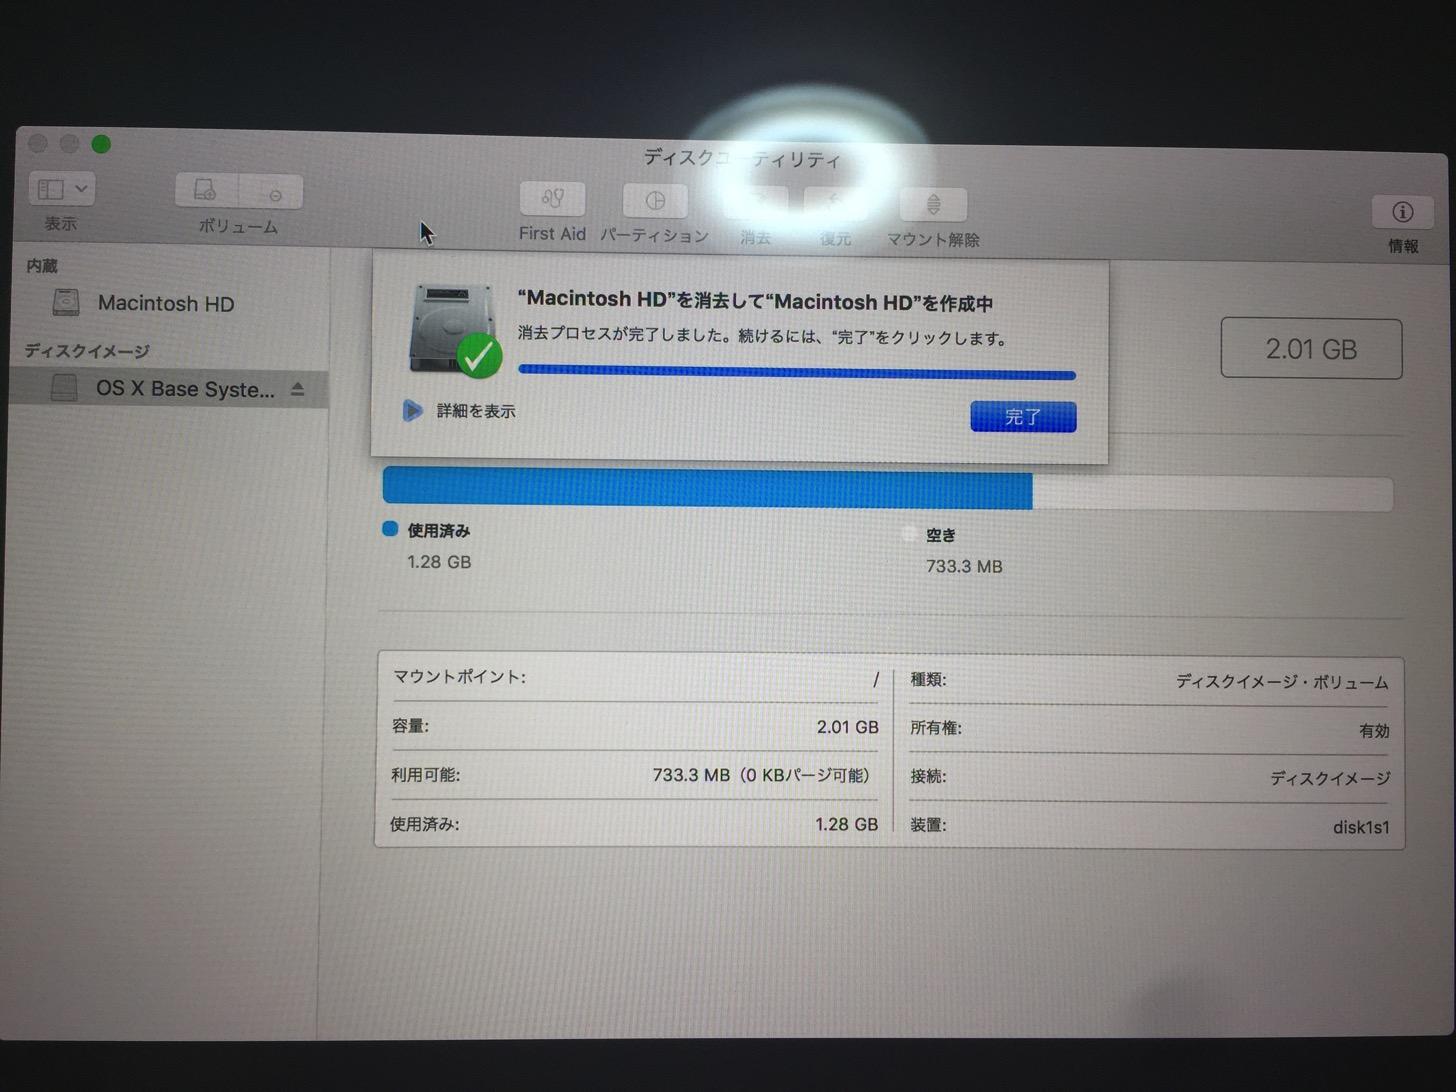 Macintosh HDの消去を完了。